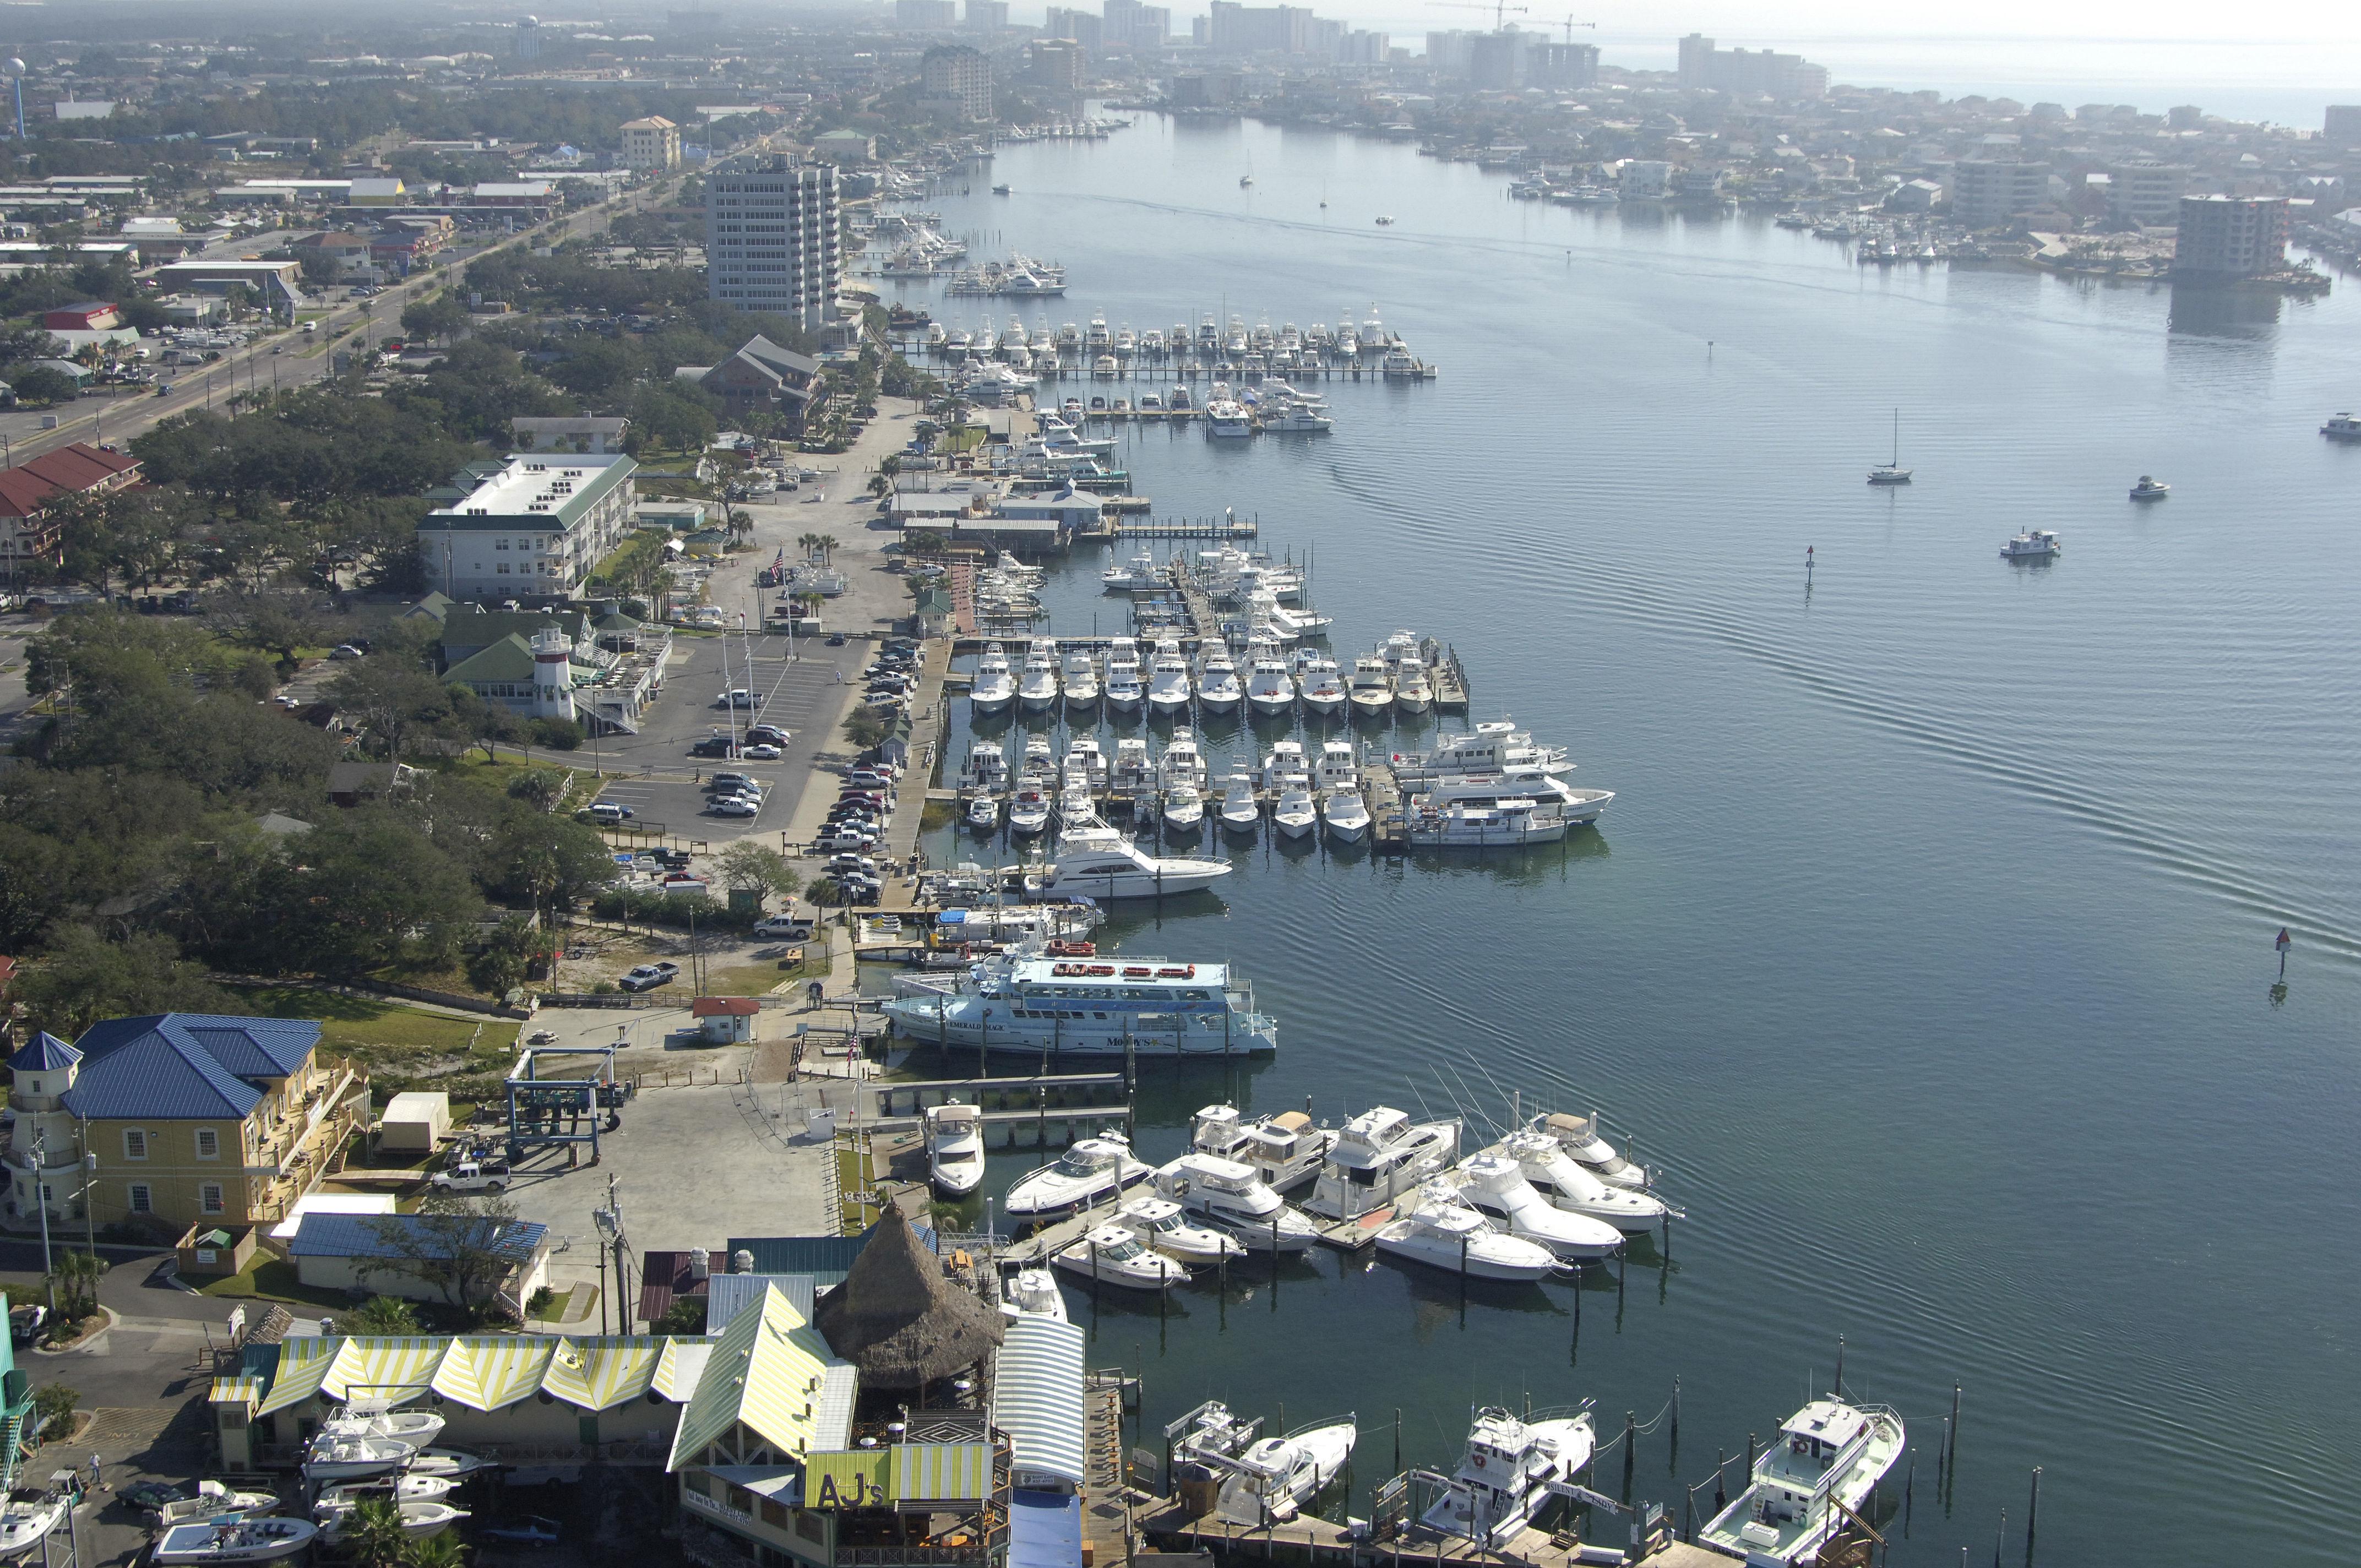 Destin fishing fleet marina in destin fl united states for Fishing in destin fl